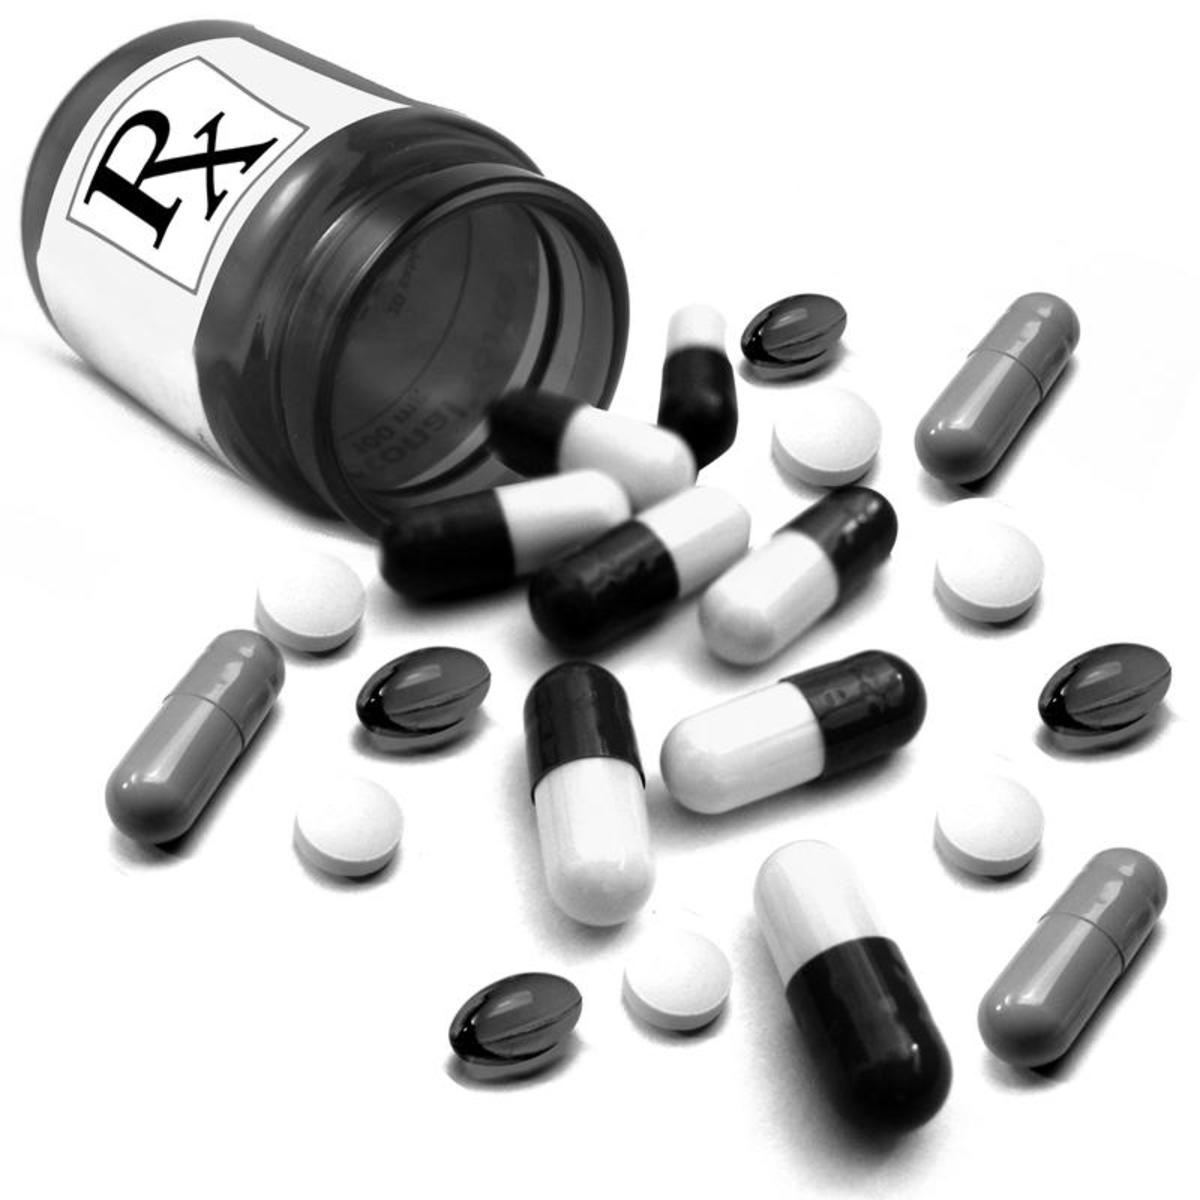 zoloft 75 mg